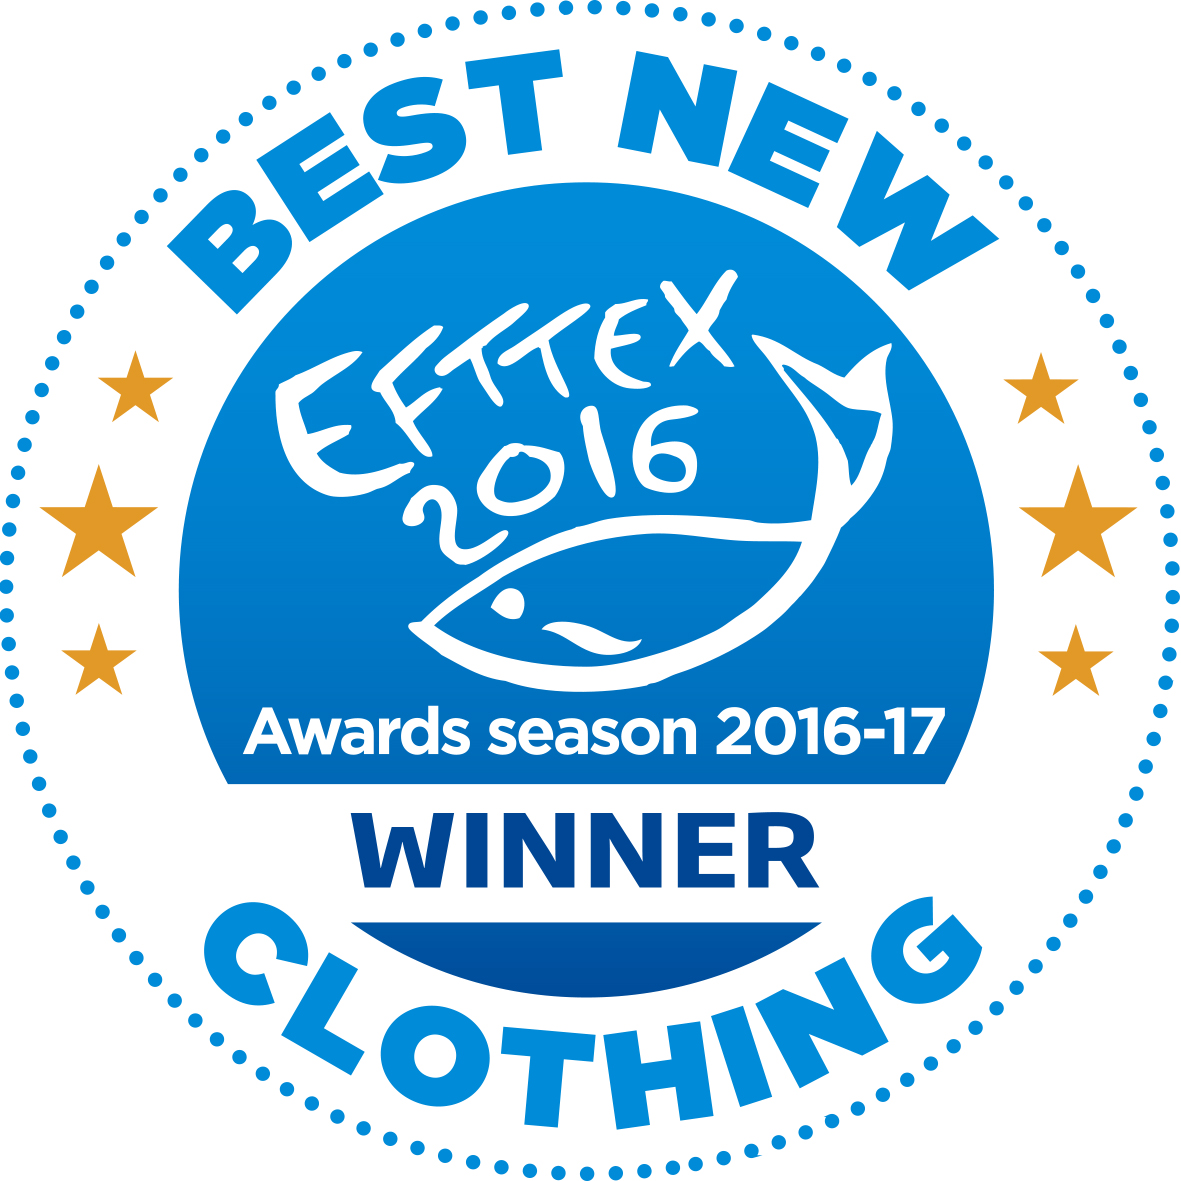 Efttex16 Winner Clothing